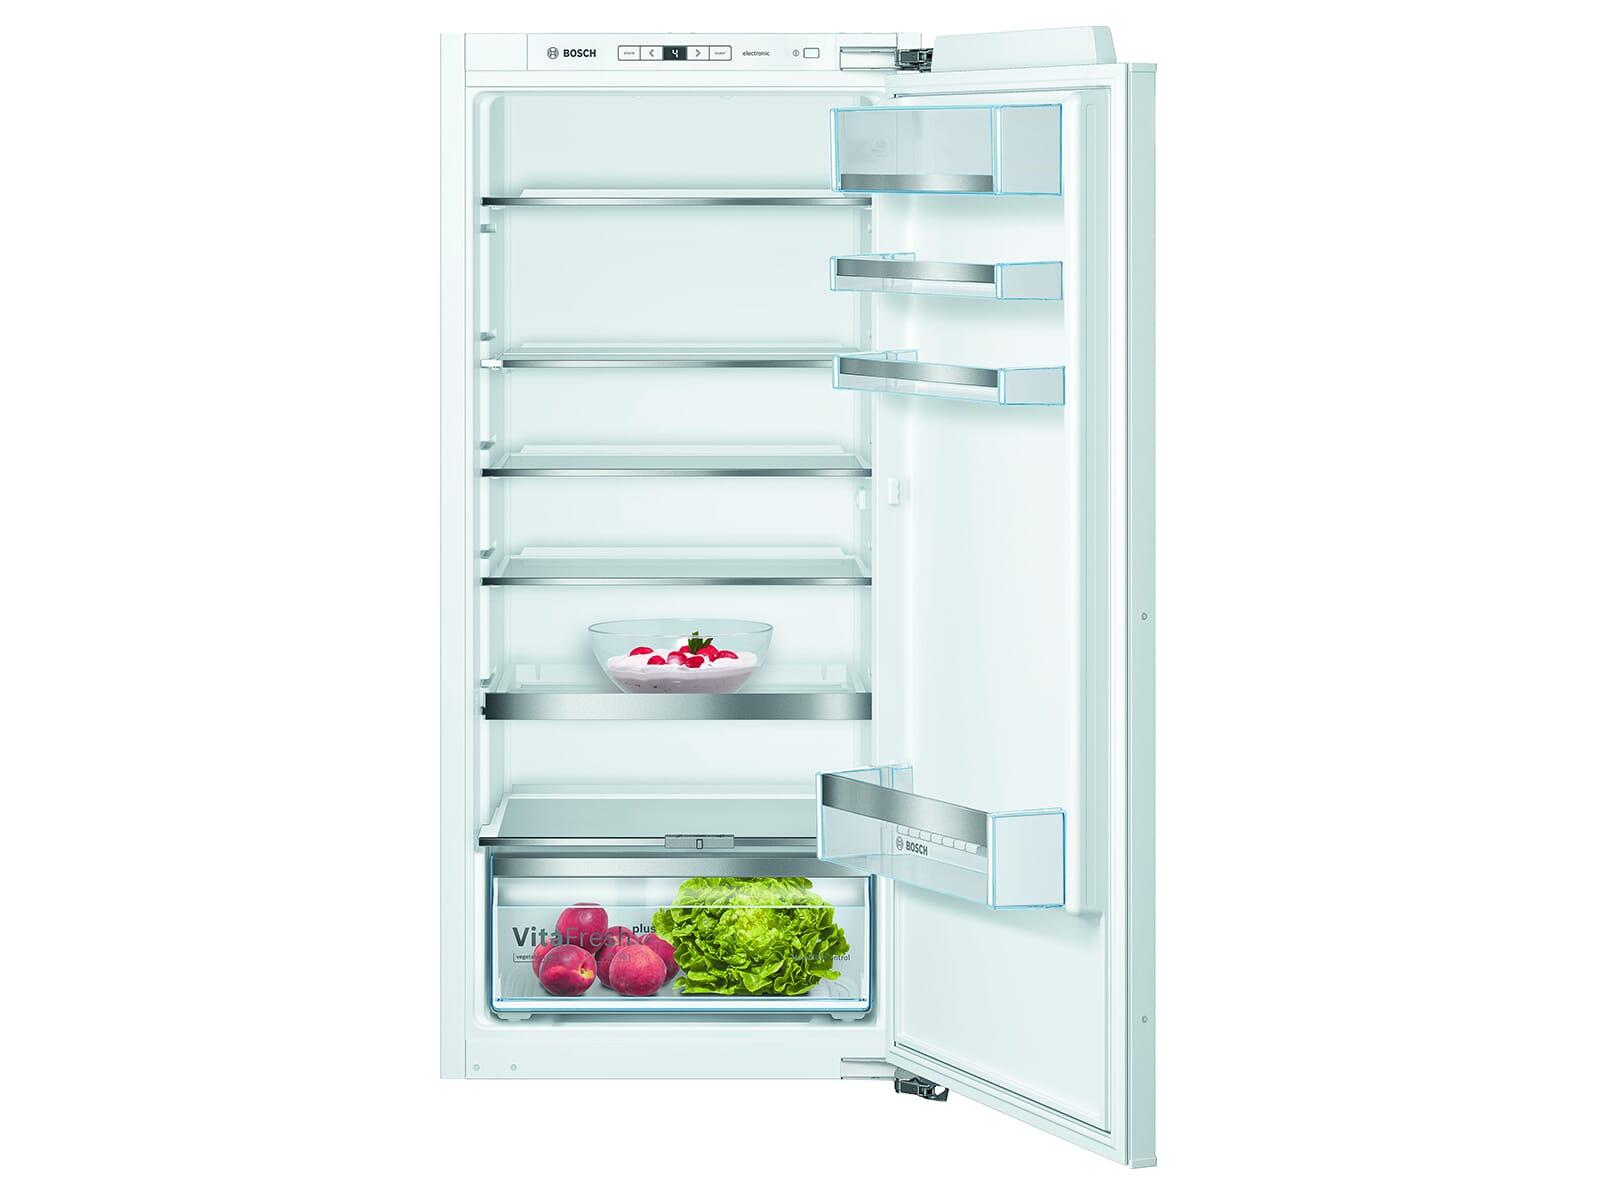 Bosch KIR41AFF0 Einbaukühlschrank